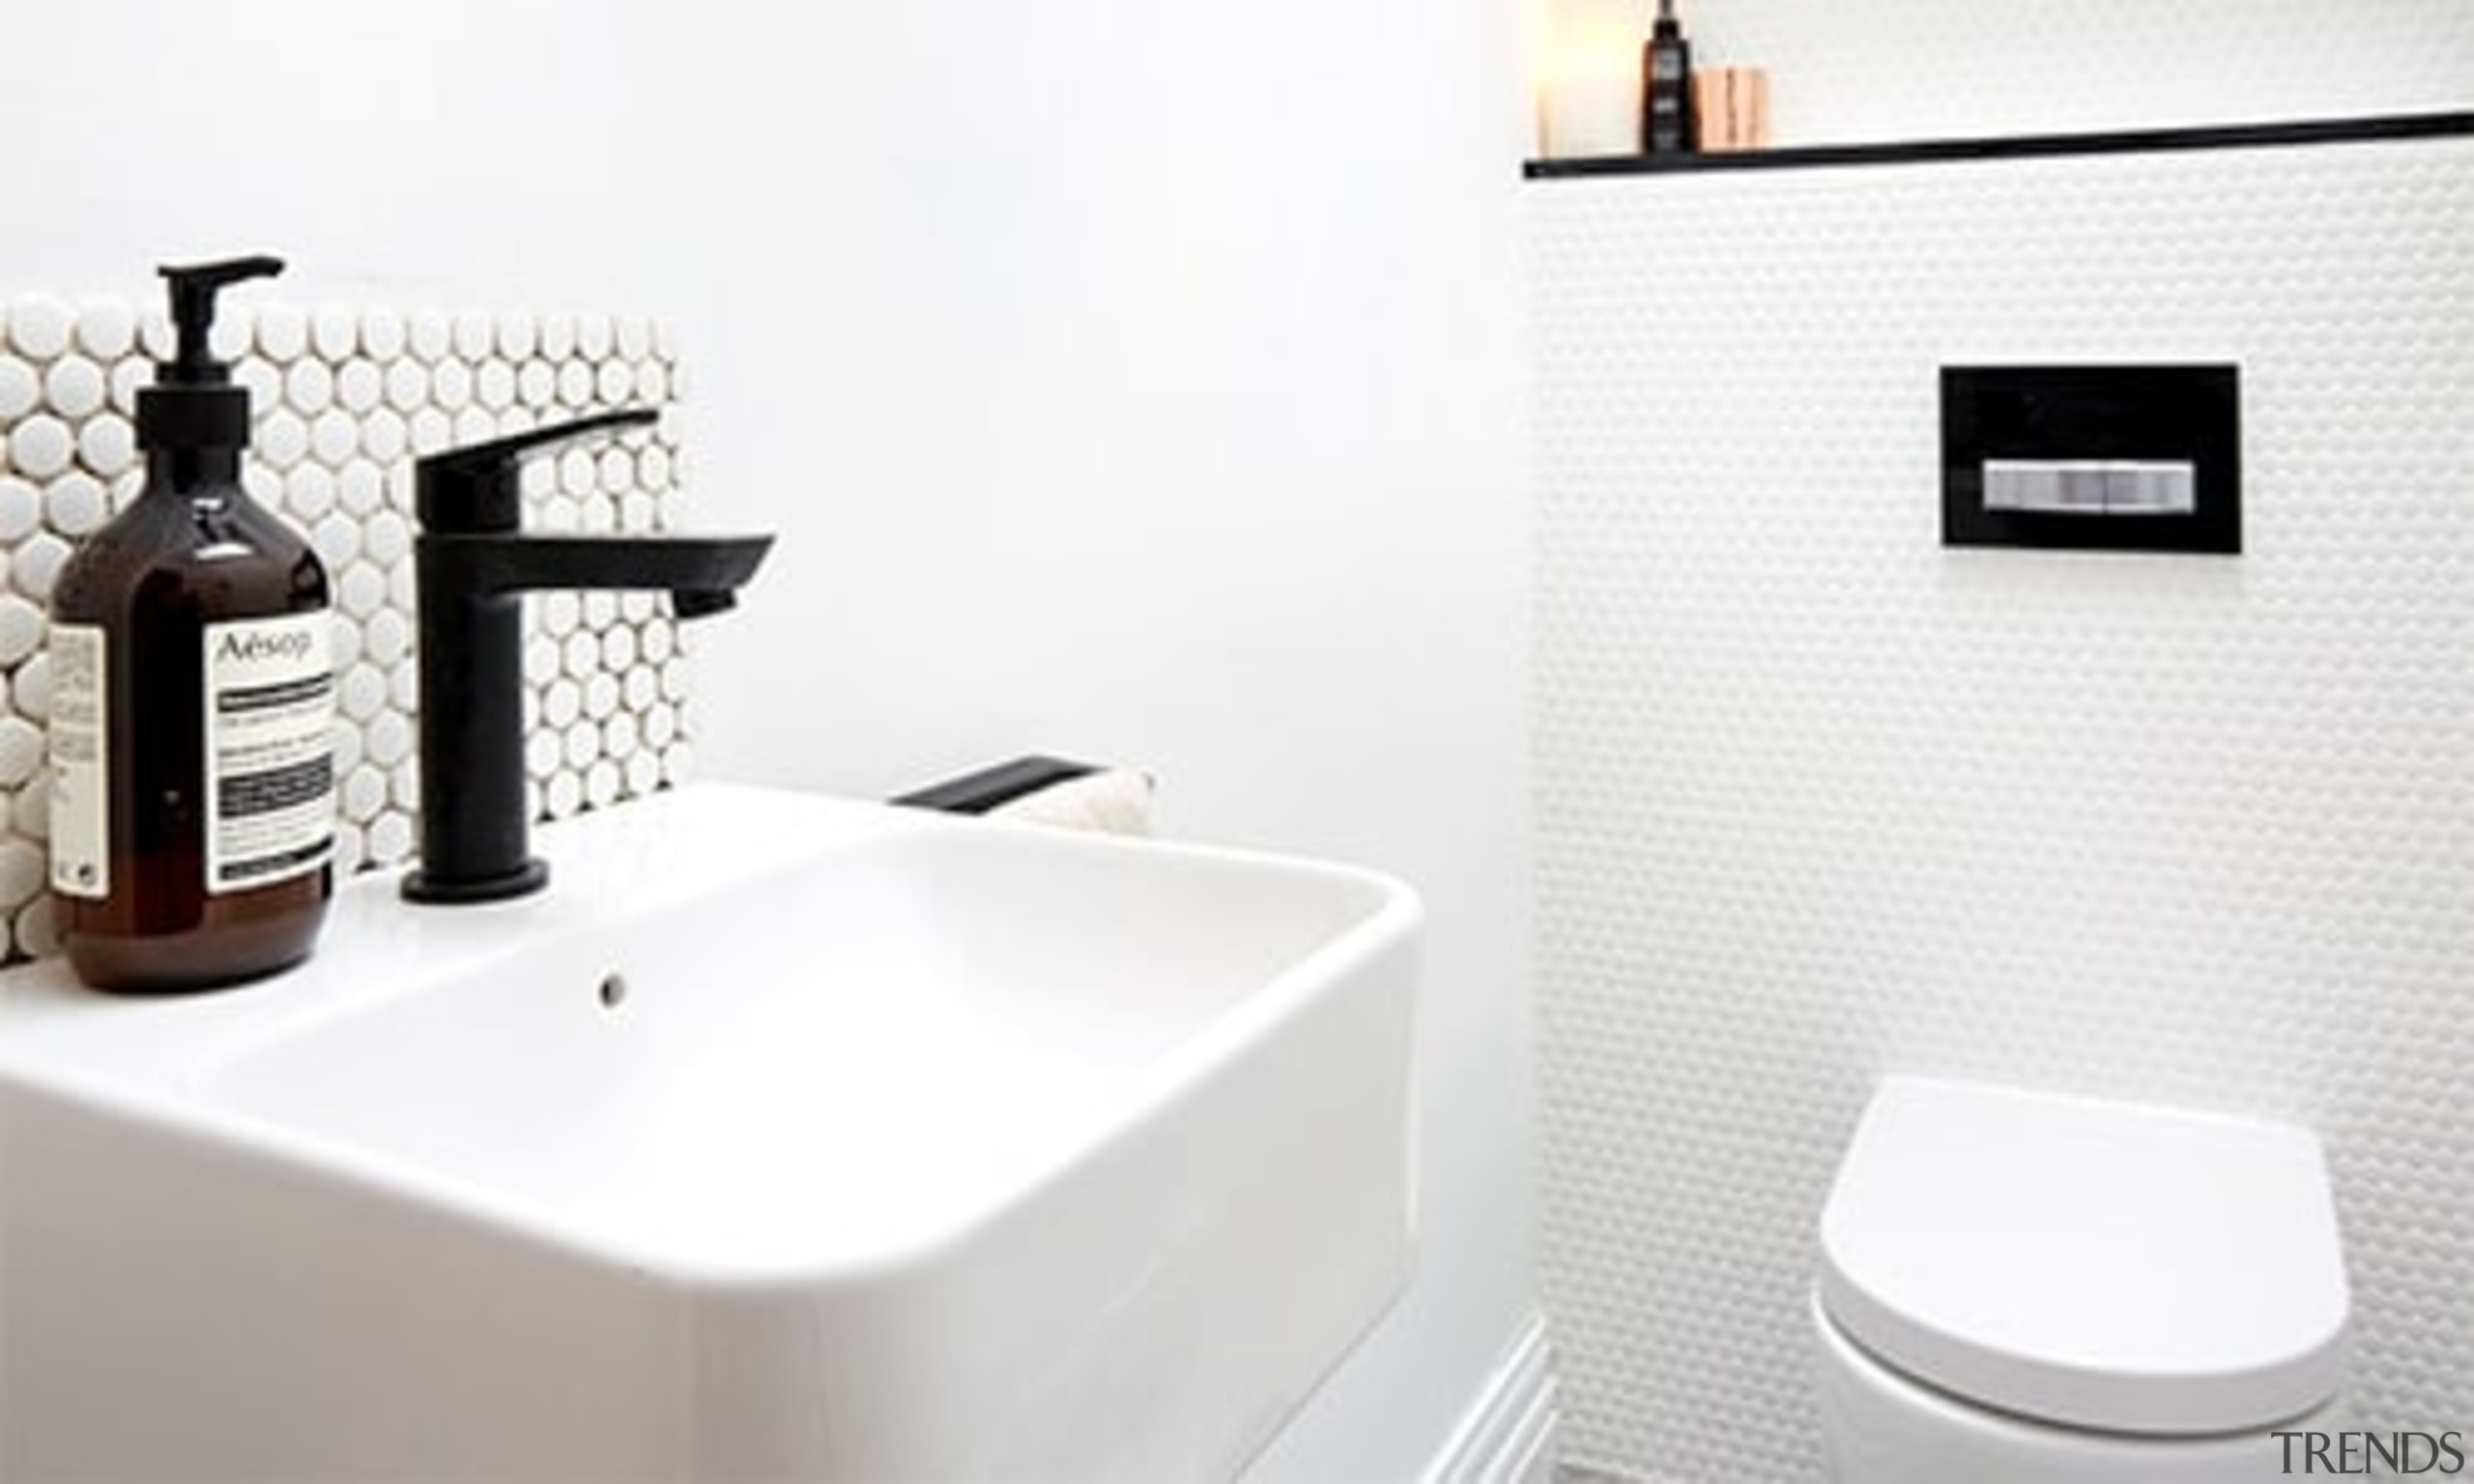 Thepowderoom Inwall Cistern Plate Black Buttons2 - bathroom bathroom, bathroom sink, ceramic, plumbing fixture, product, room, sink, tap, toilet seat, white